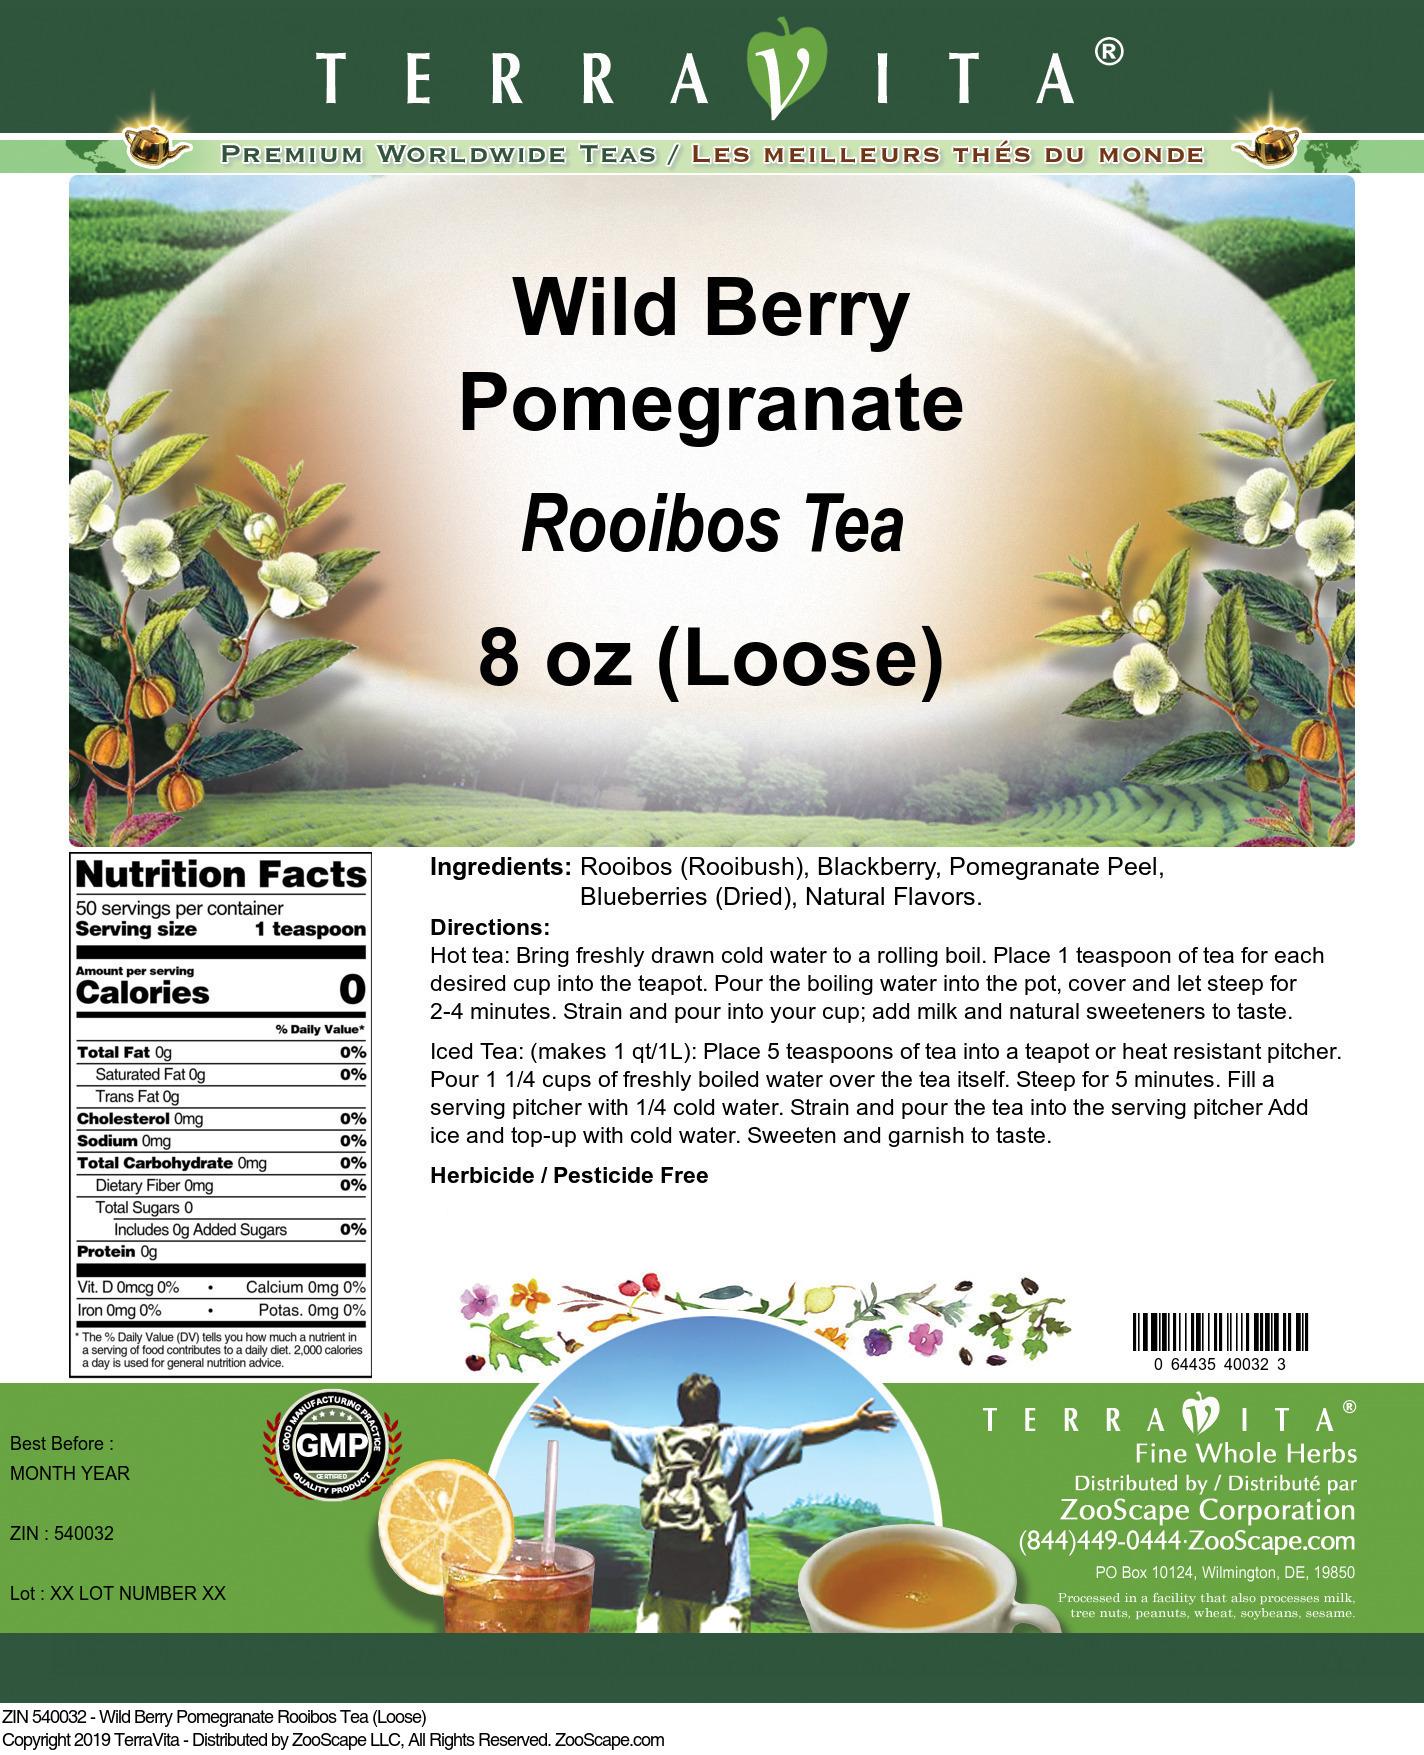 Wild Berry Pomegranate Rooibos Tea